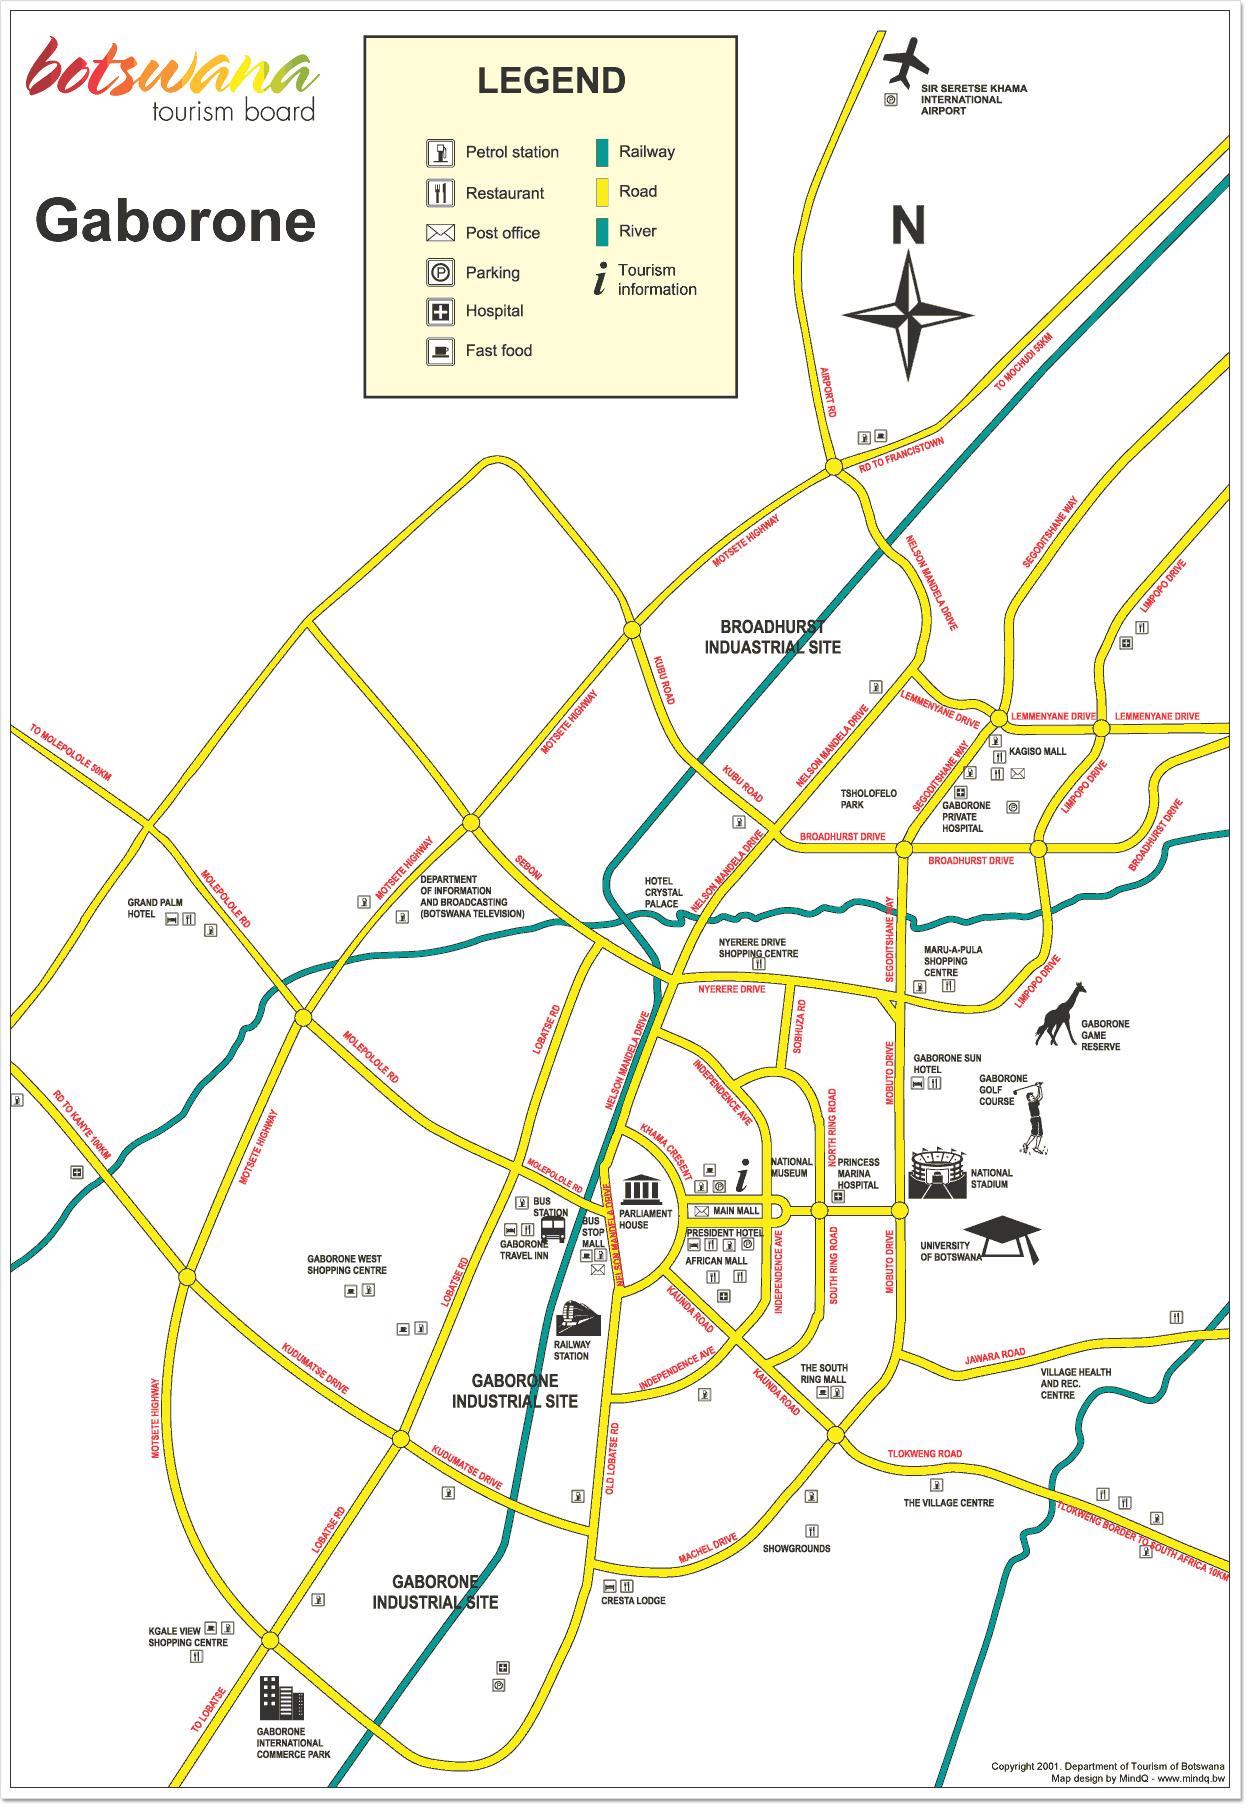 map of gaborone city botswana Detailed Map Of Gaborone City Gaborone City Detailed Map map of gaborone city botswana